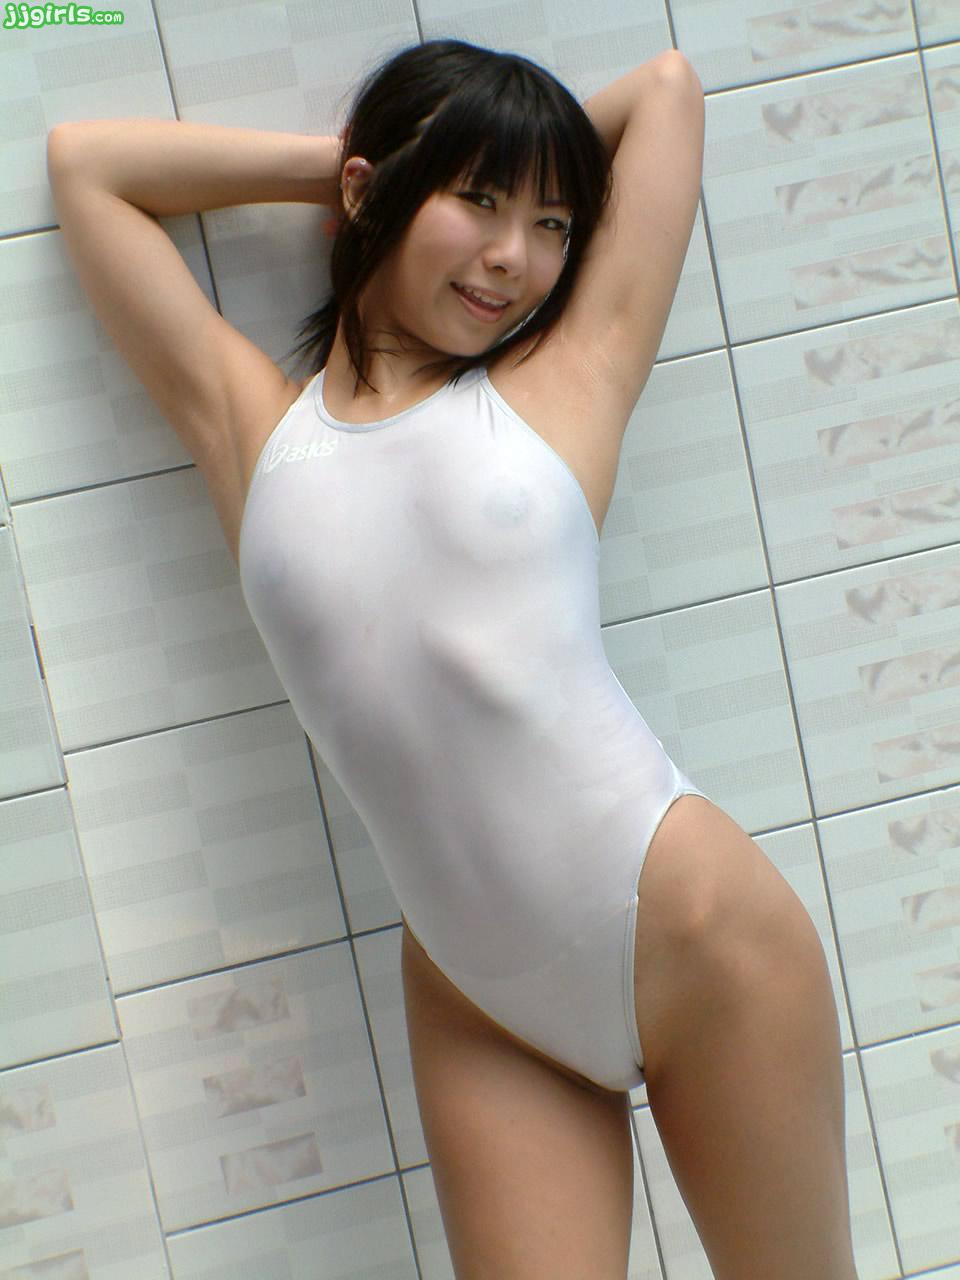 Momo Shiina nude photos ... Yu Shiina ...